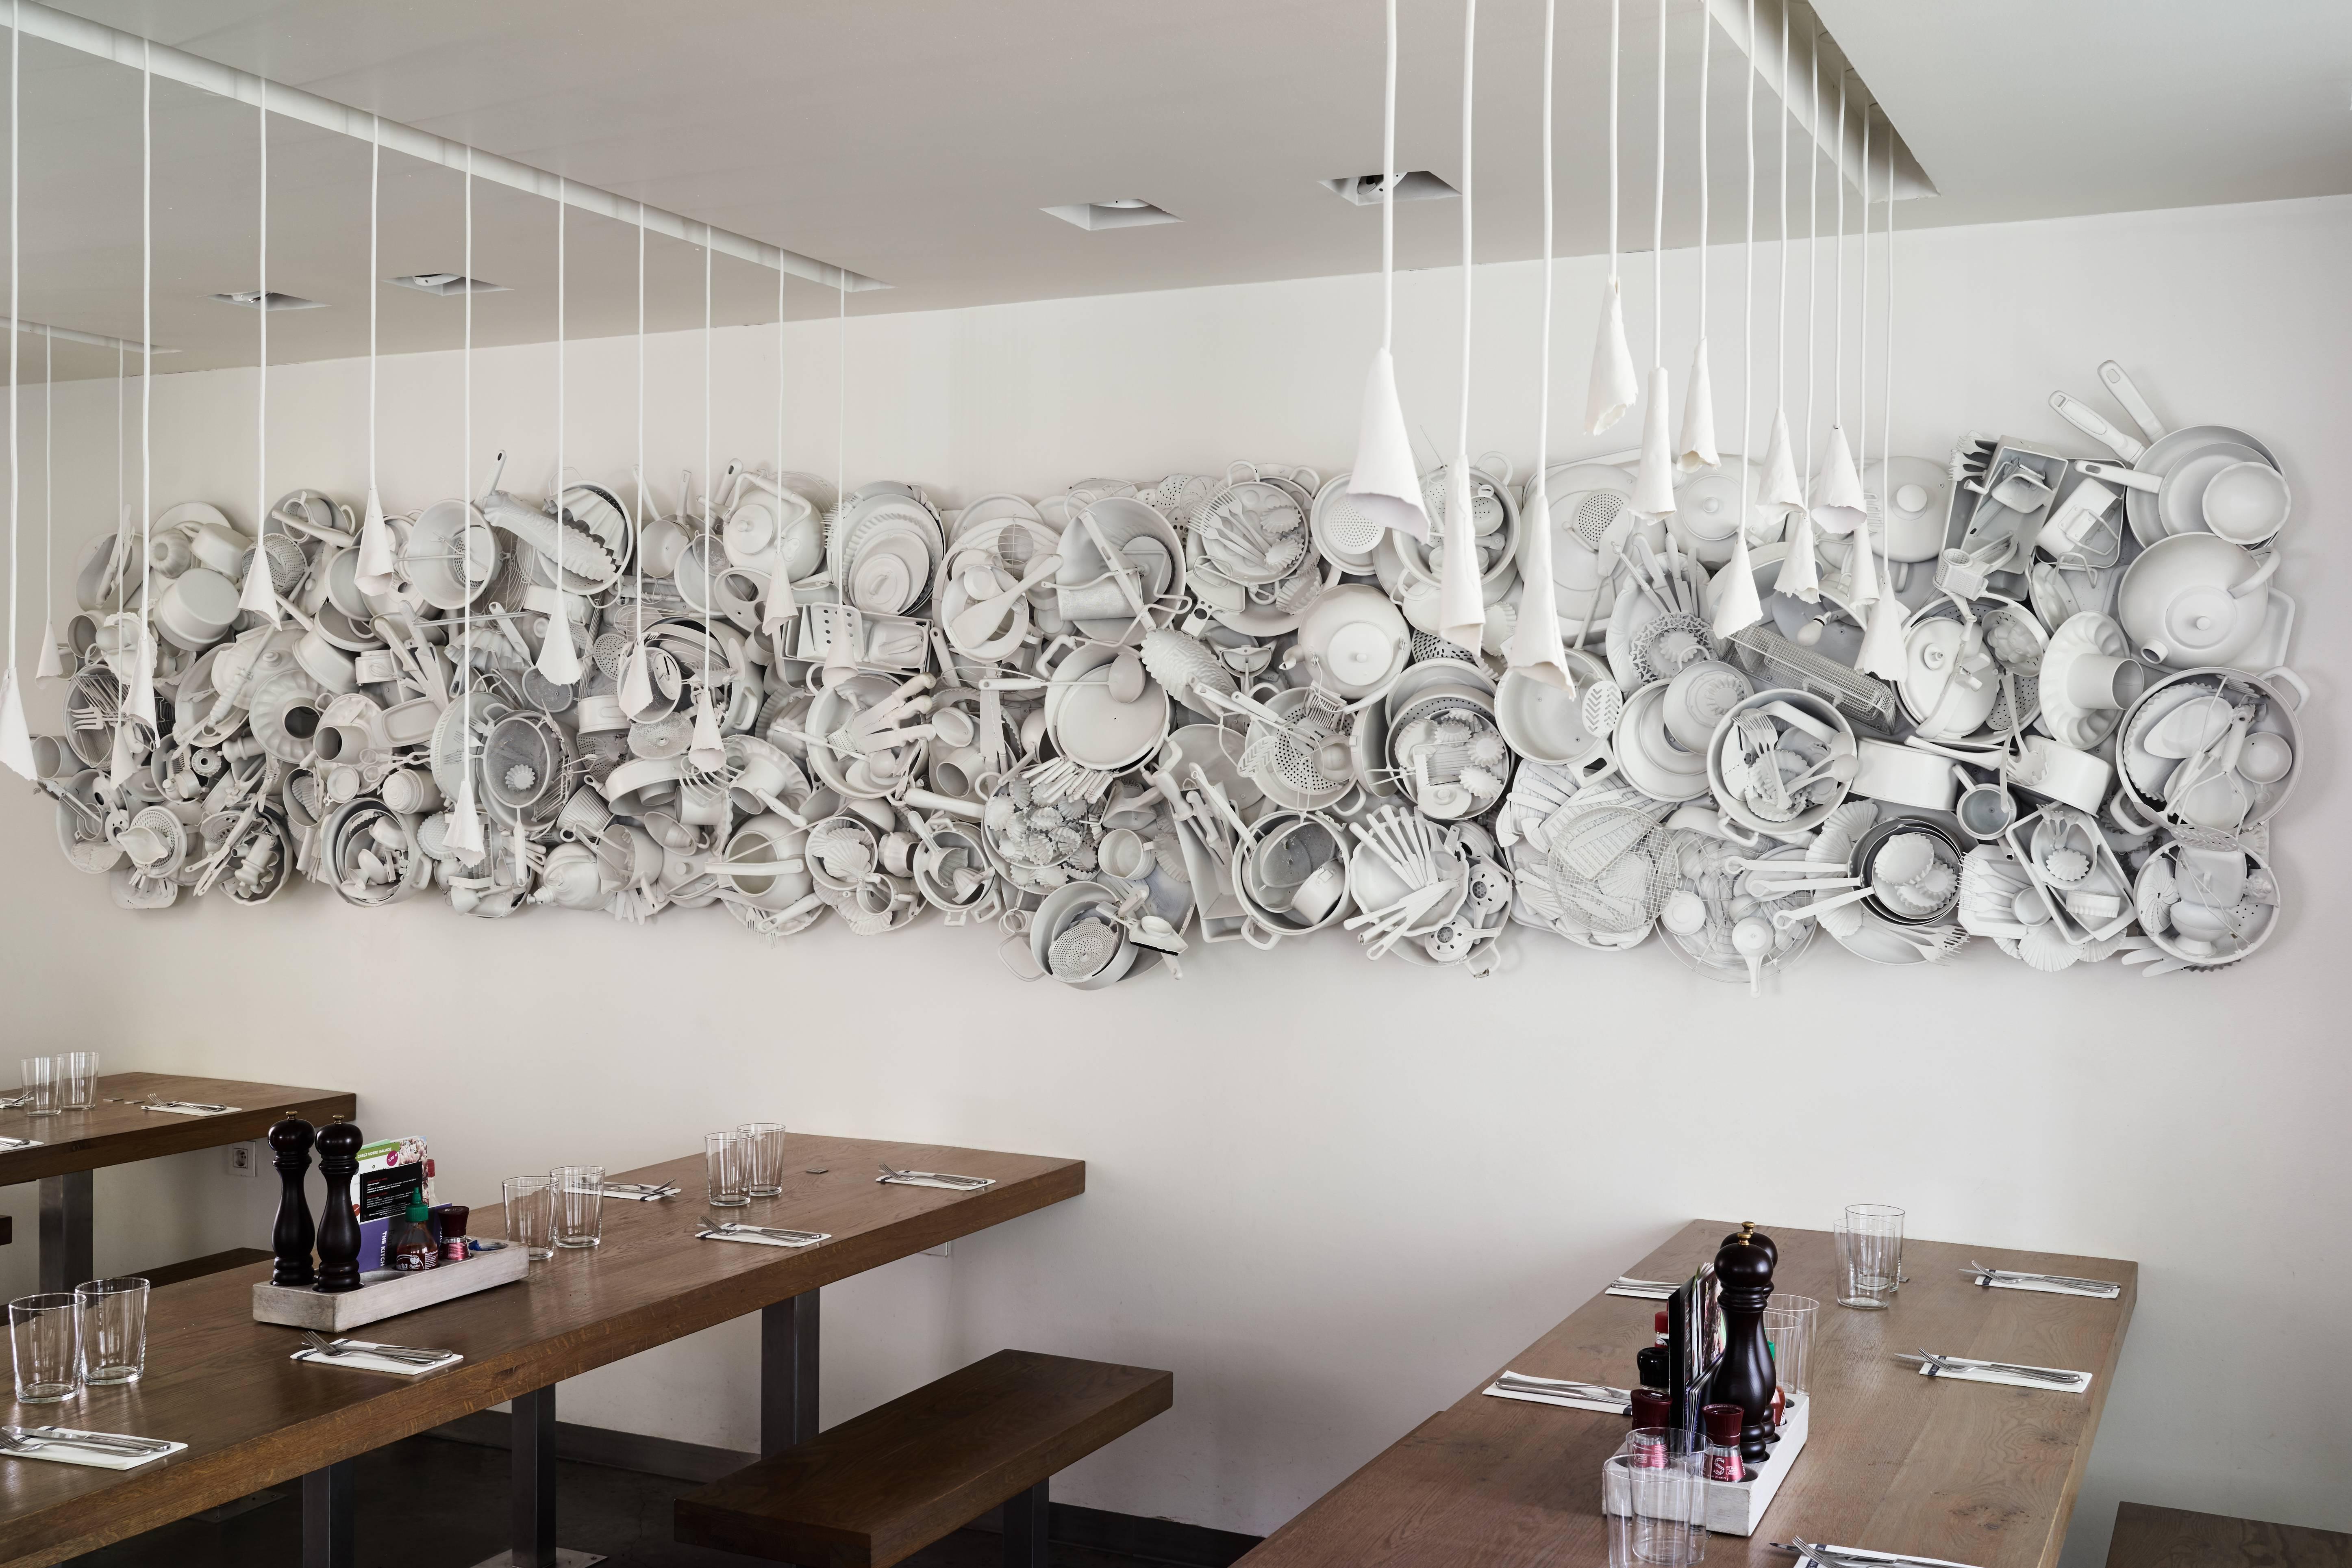 Delightful Belgian No Limits Kitchen Utensils Fine Art Wall Sculptures For Sale